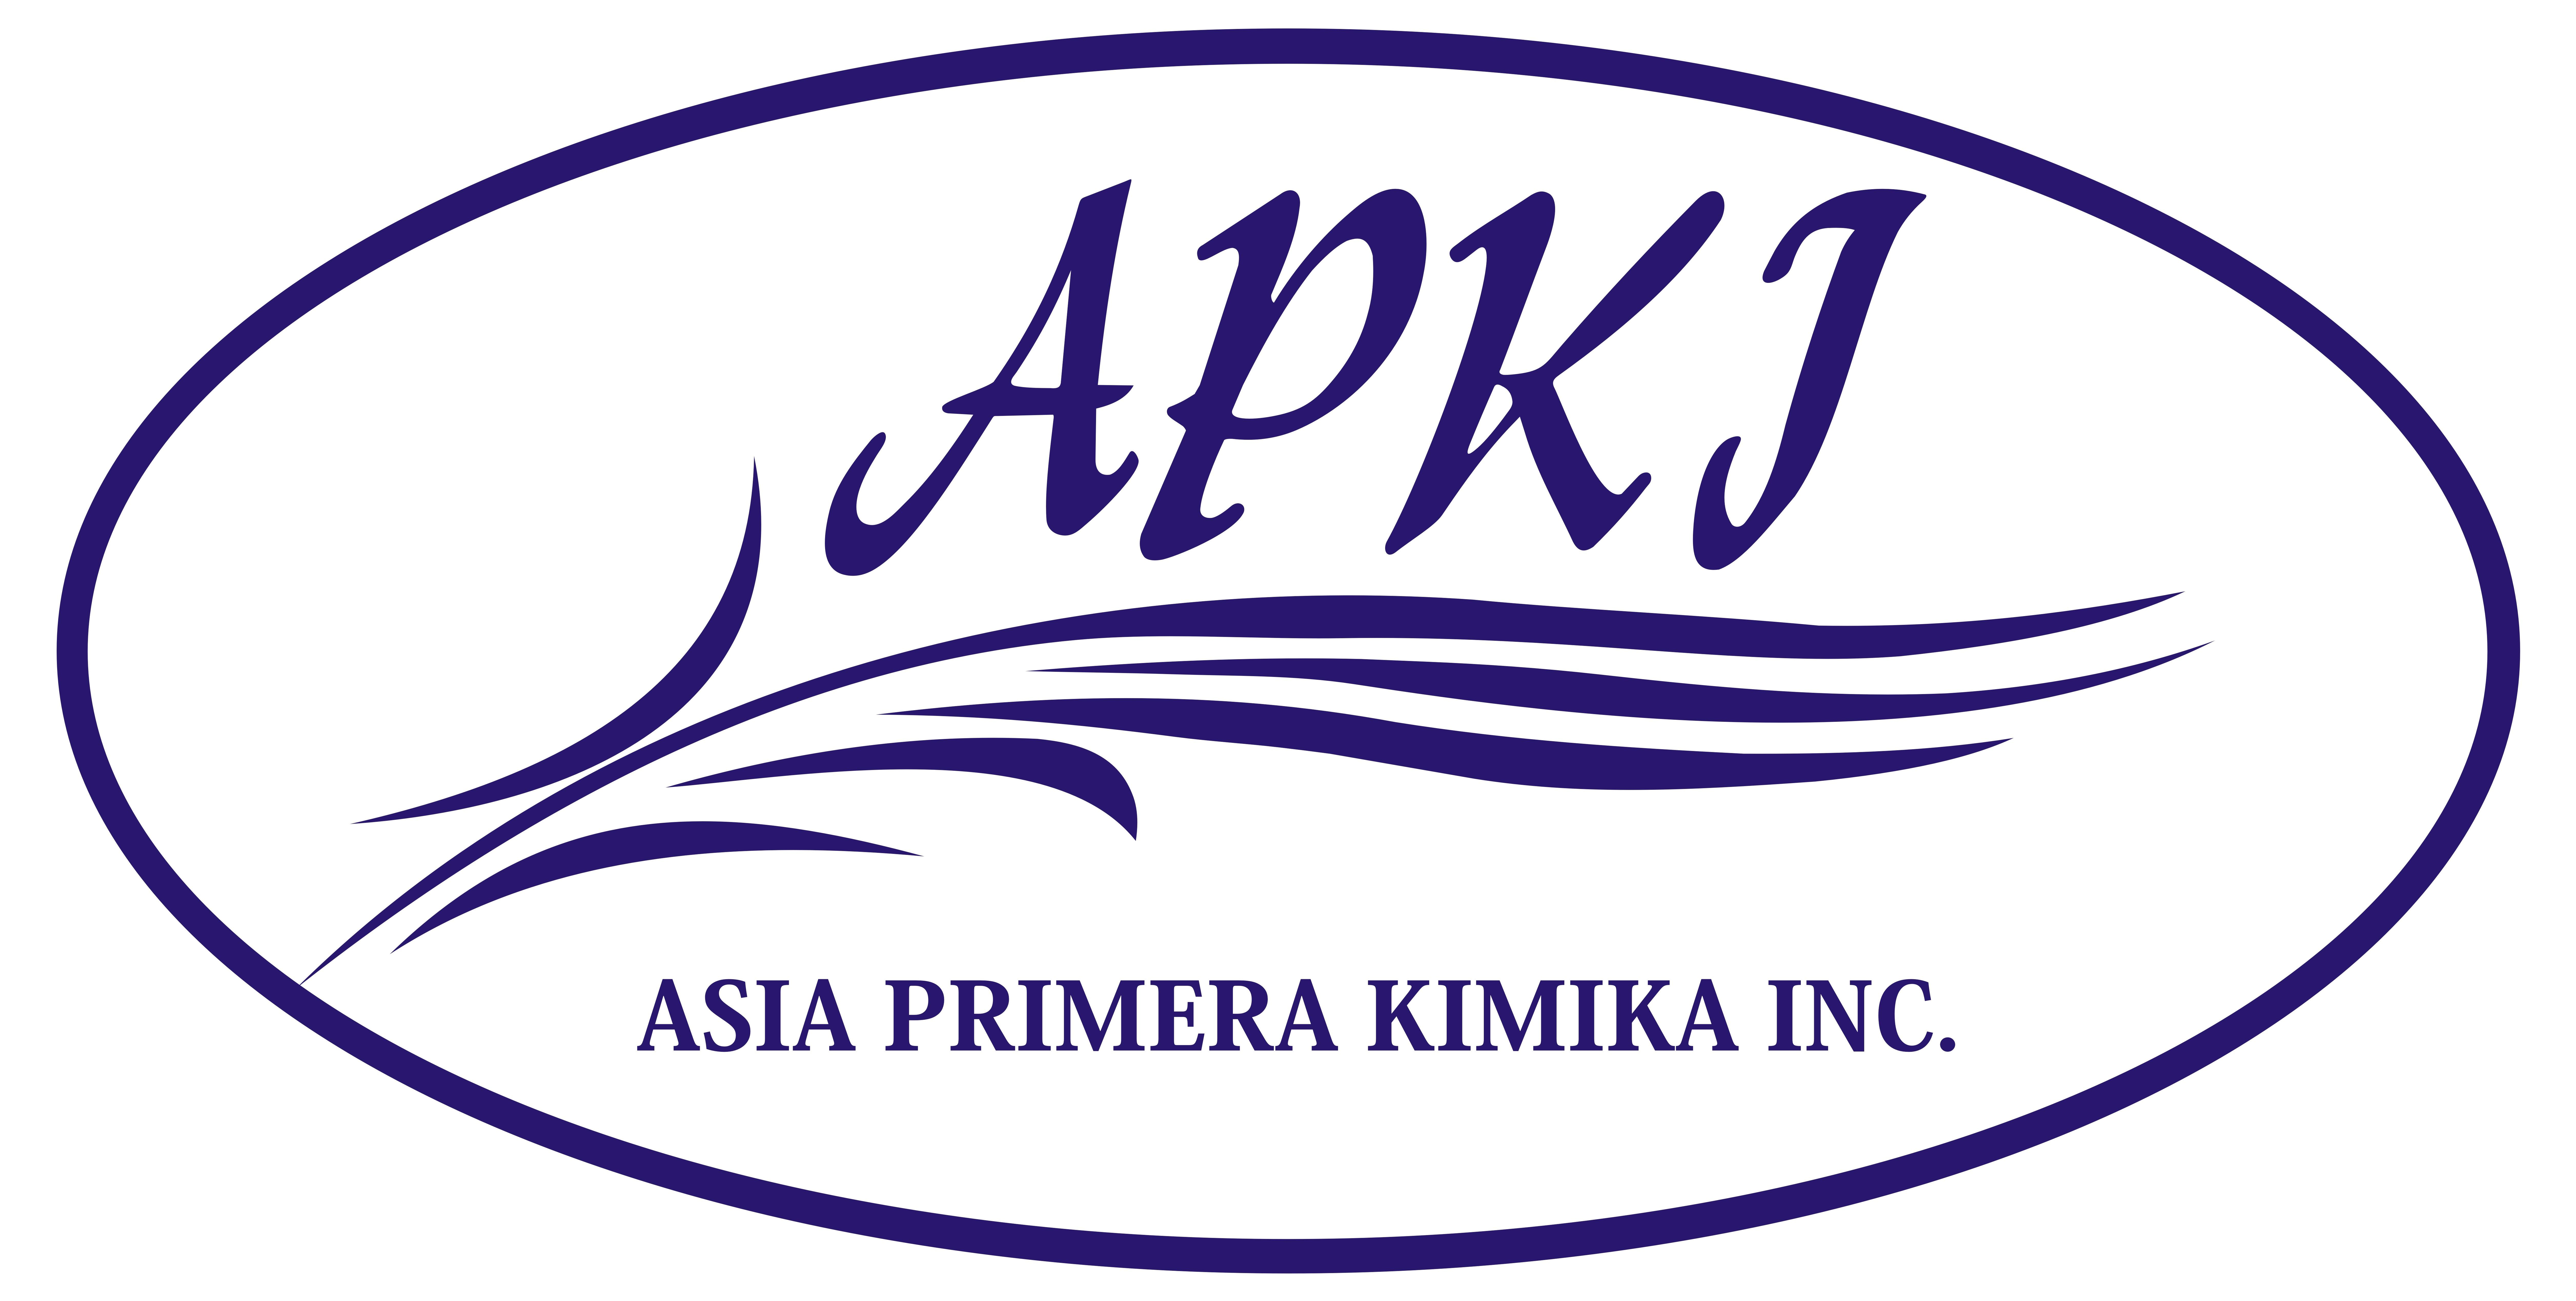 Asia Primera Kimika, Inc.